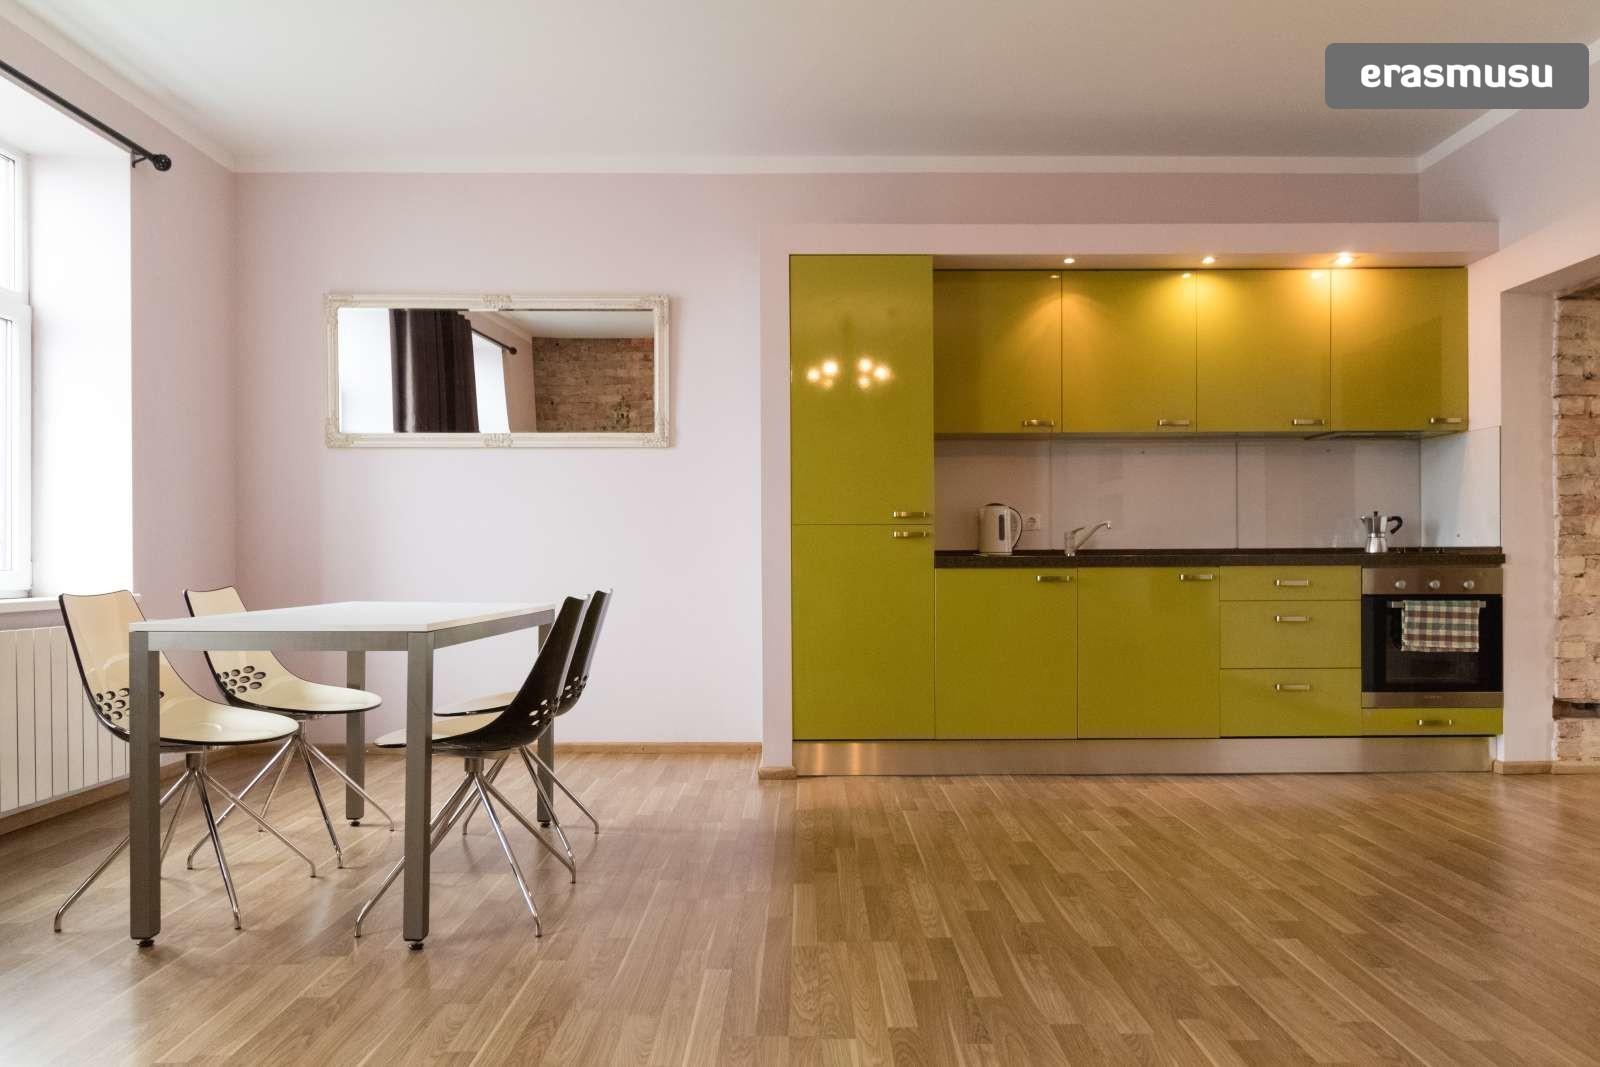 stylish-2-bedroom-apartment-rent-maskavas-forstate-763dc406d7729